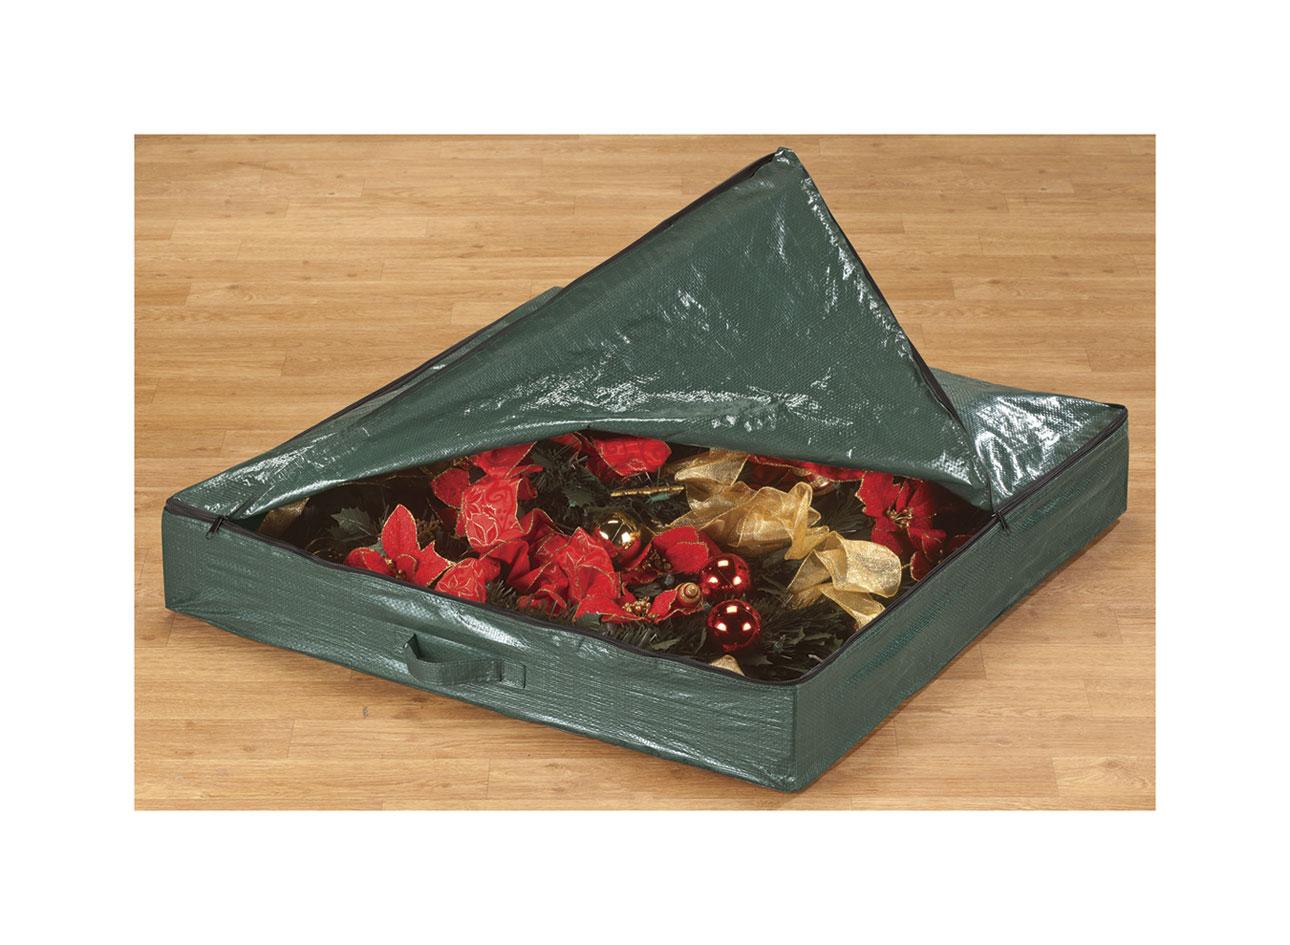 6 Foot Decorated Pop Up Tree Storage Bag 75139817713 Ebay